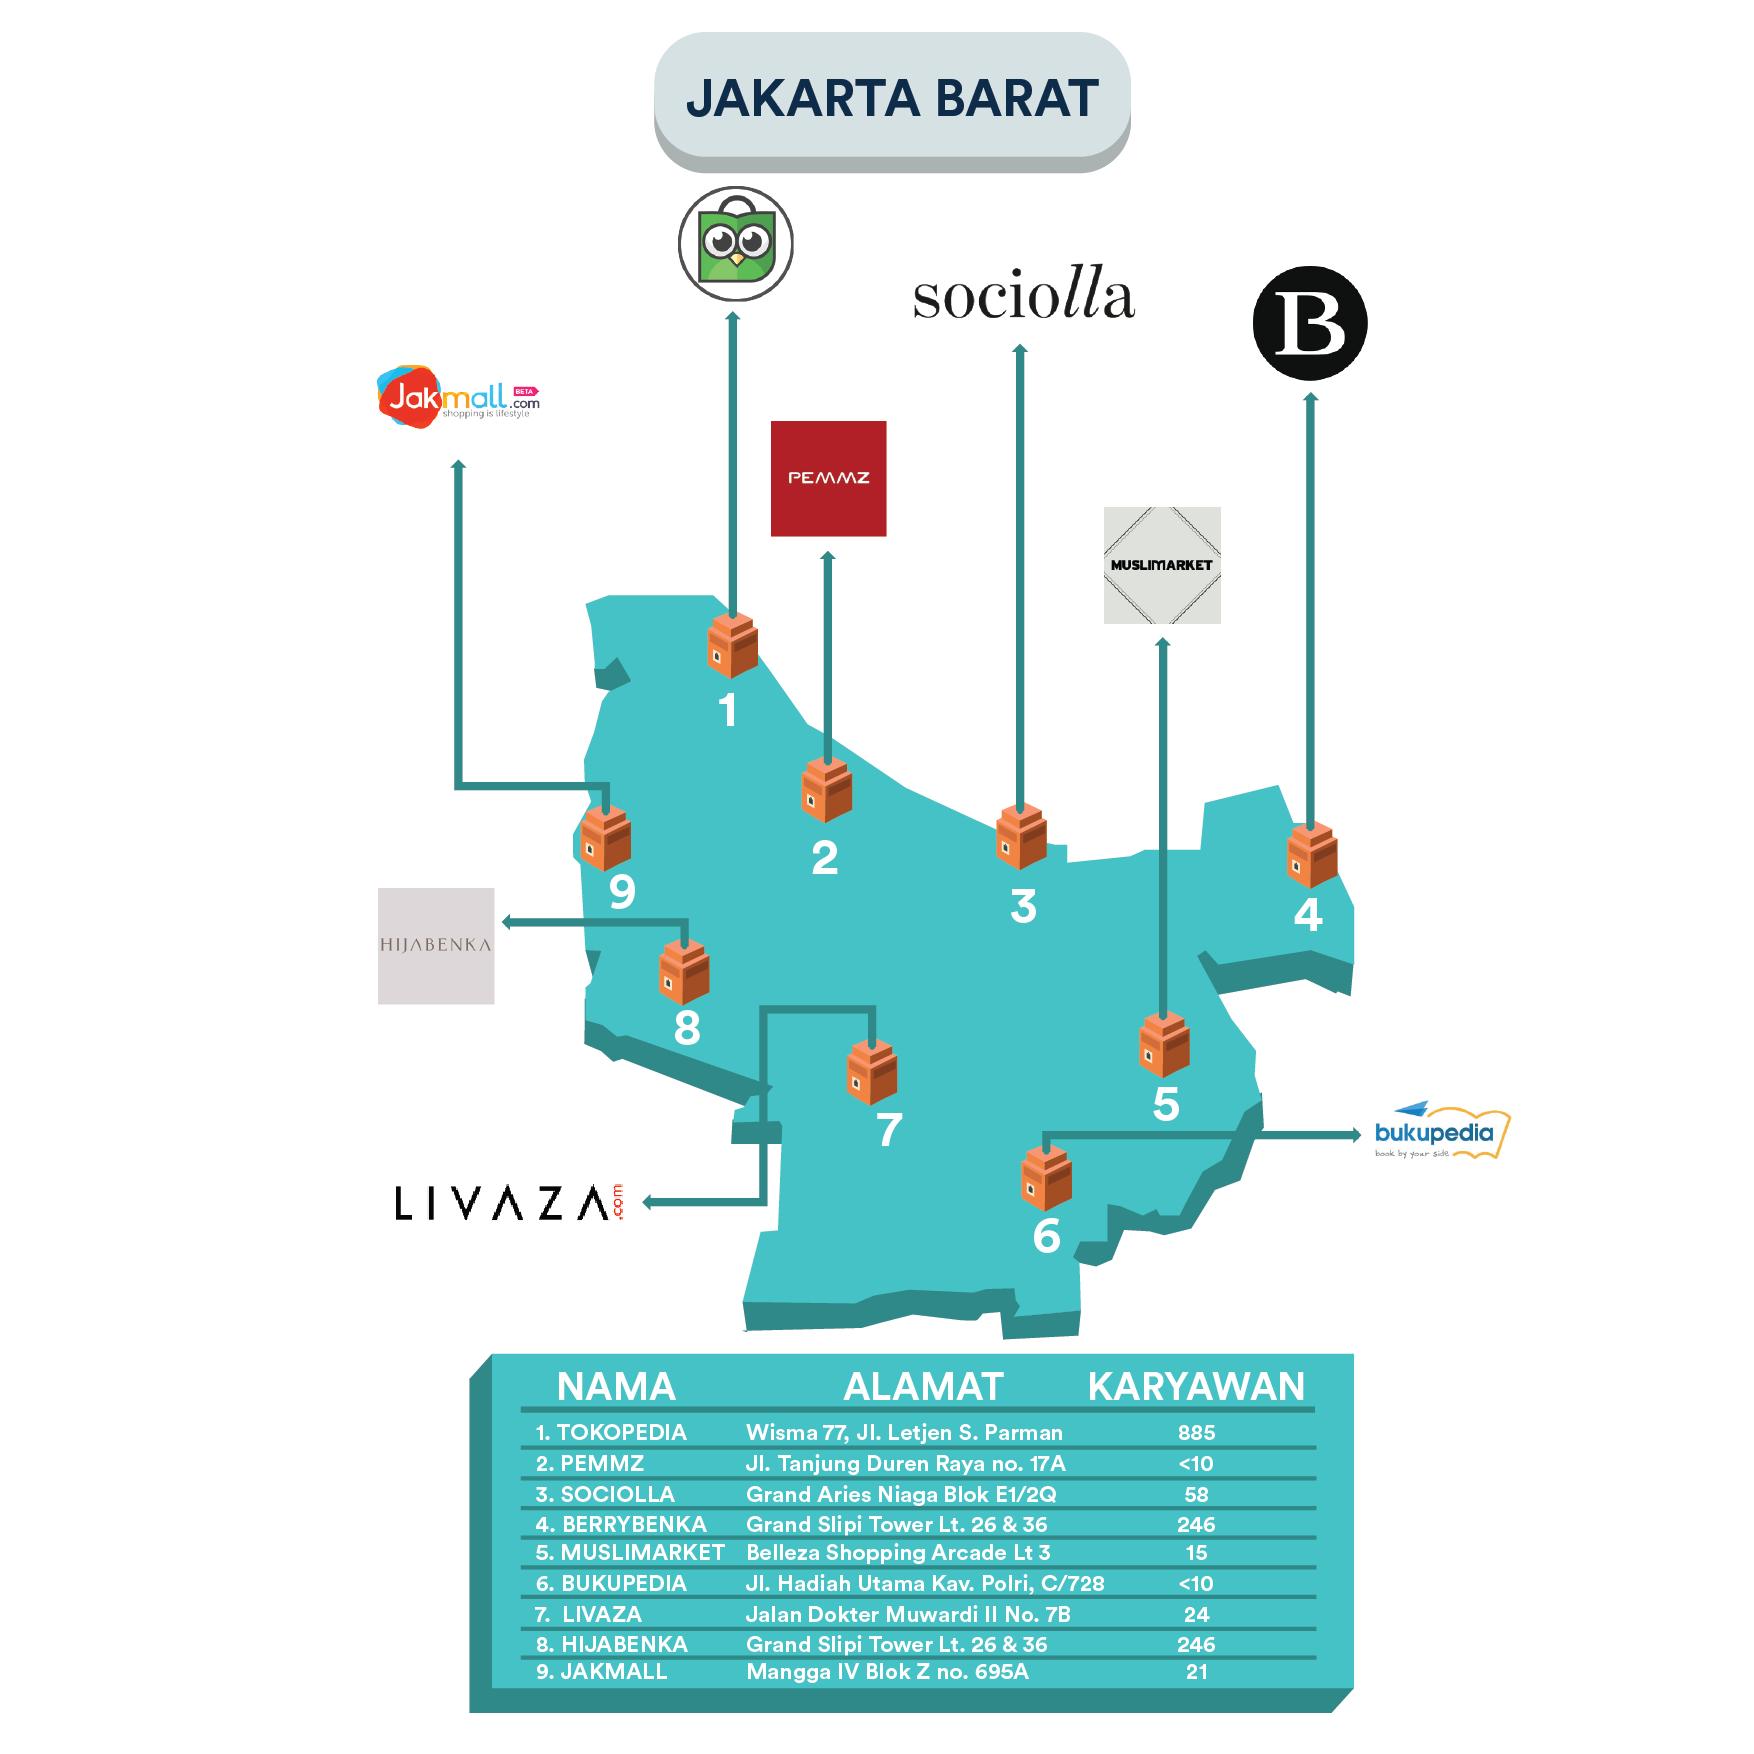 Jakarta Barat